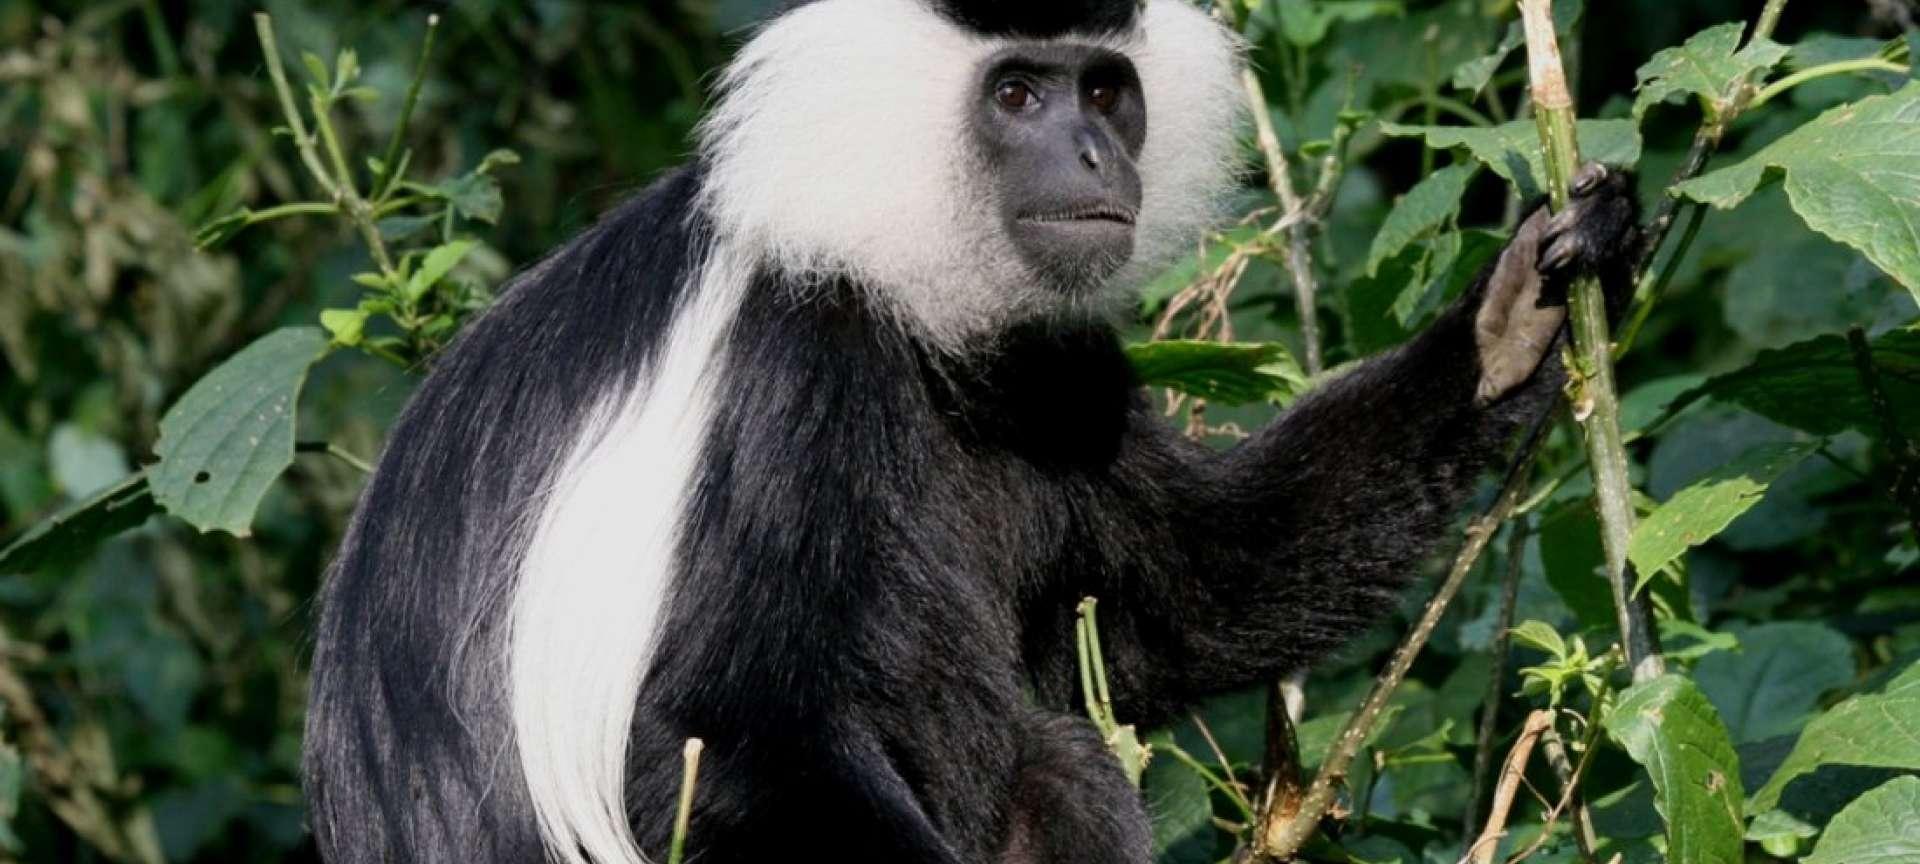 Nyungwe Forest - Africa Wildlife Safaris